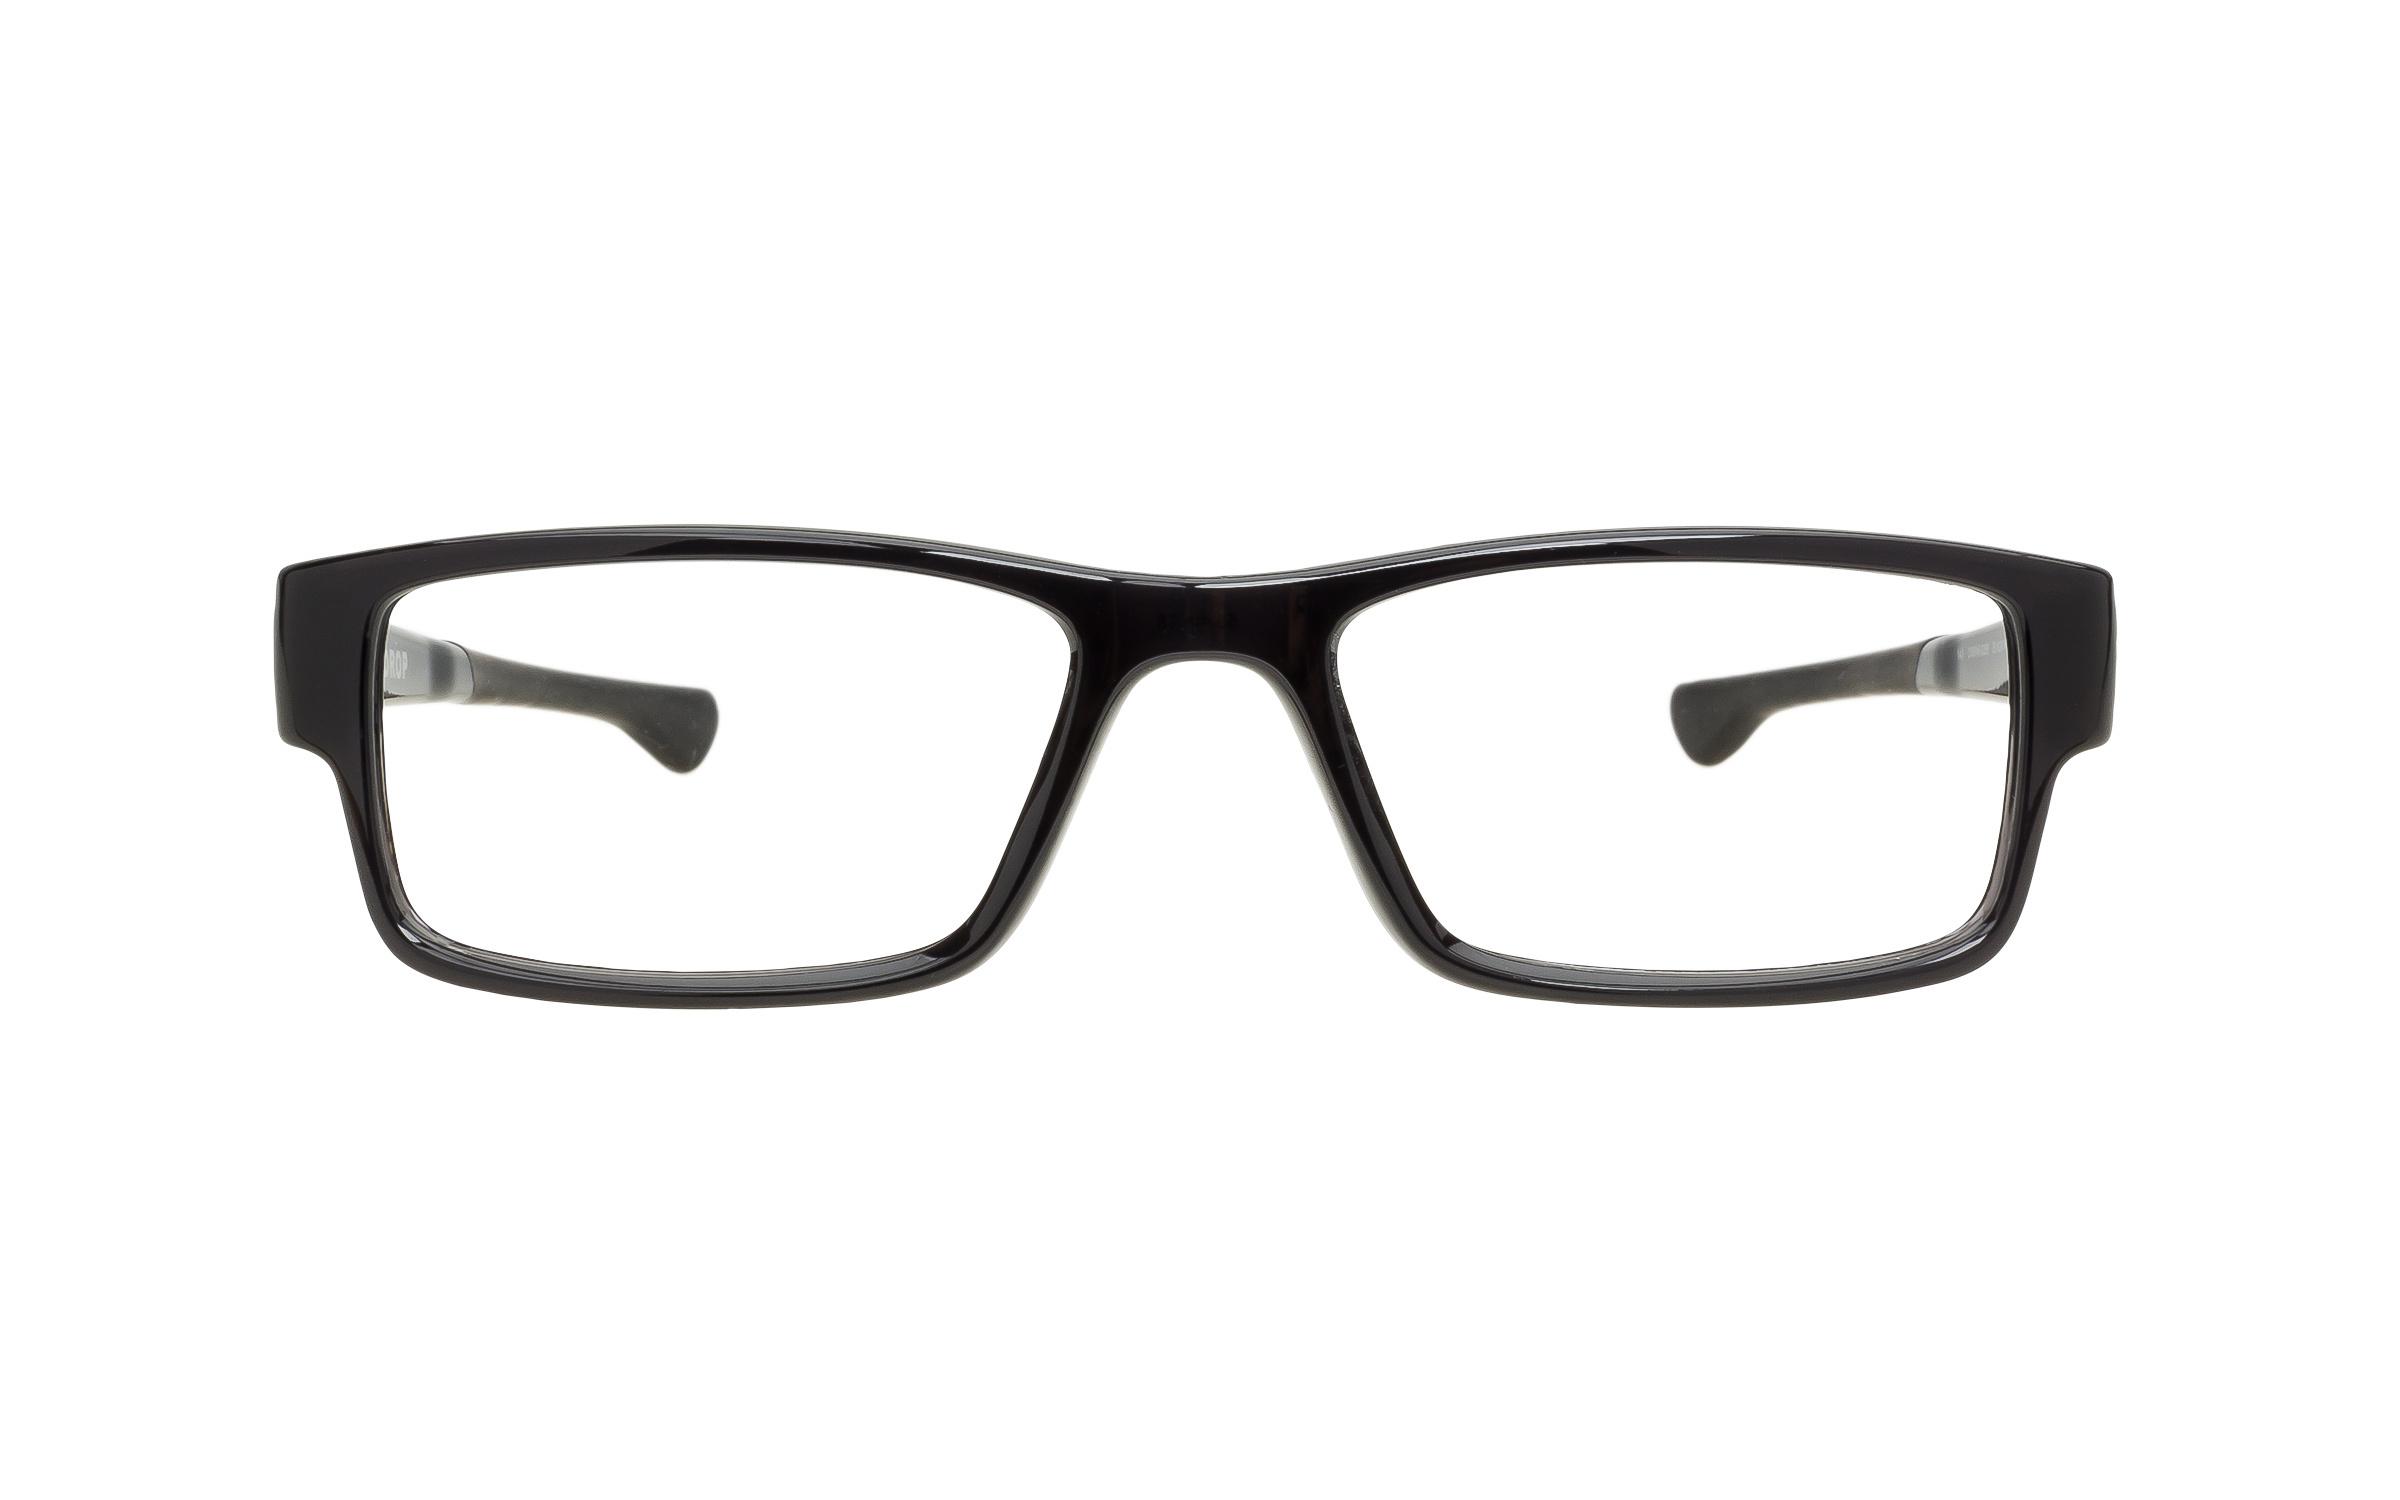 Oakley Airdrop OX8046 02 Eyeglasses and Frame in Ink Black - Online Coastal